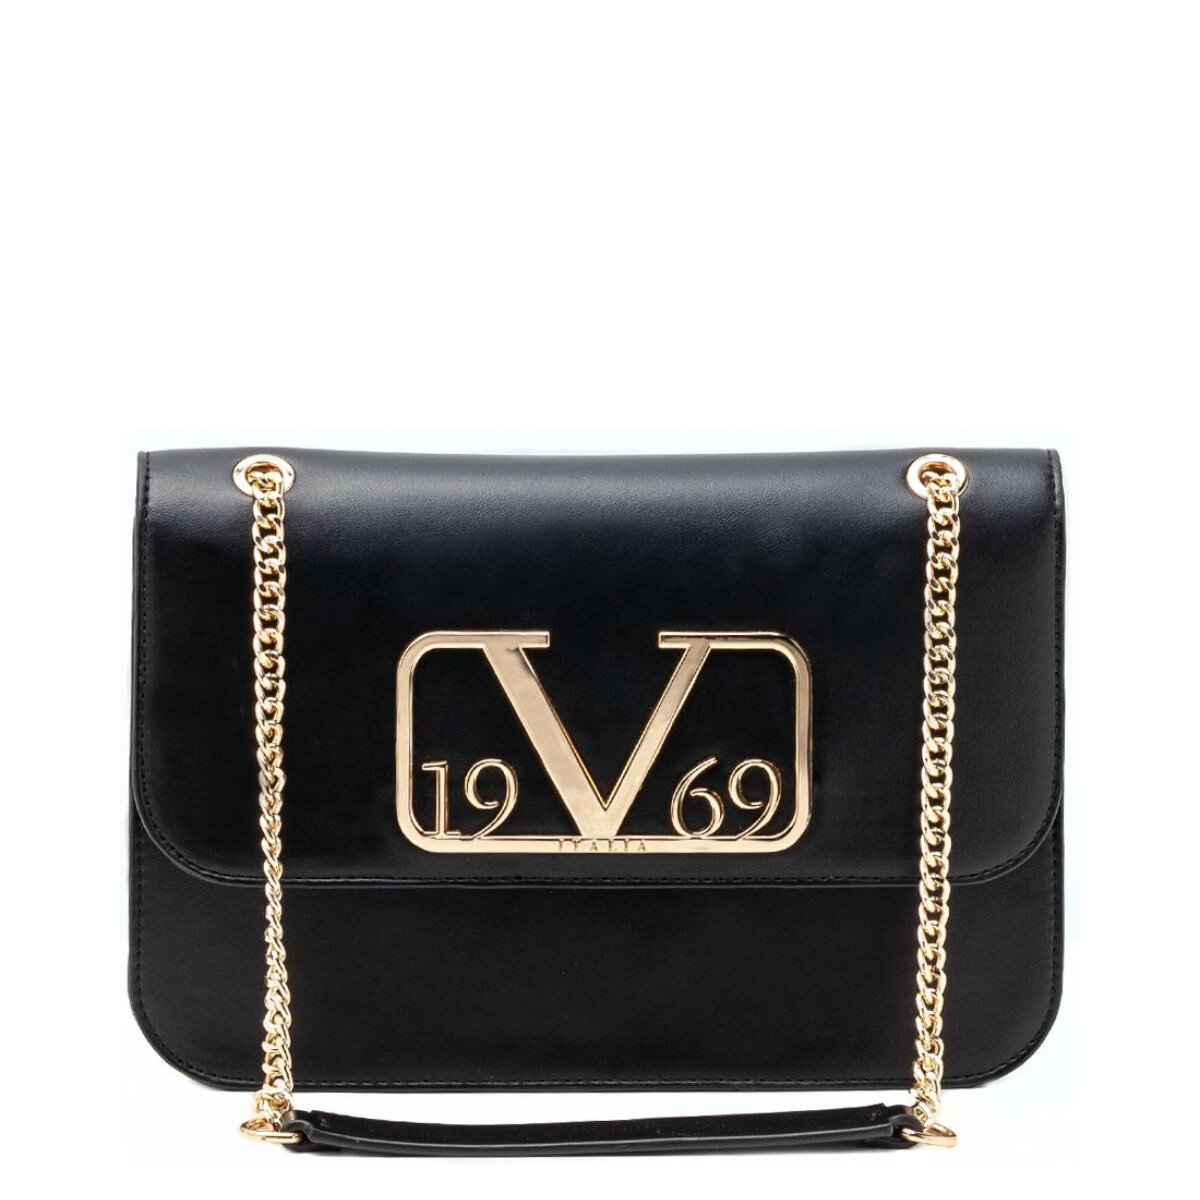 19v69 Italia Women's Handbag Various Colours 318965 - black UNICA